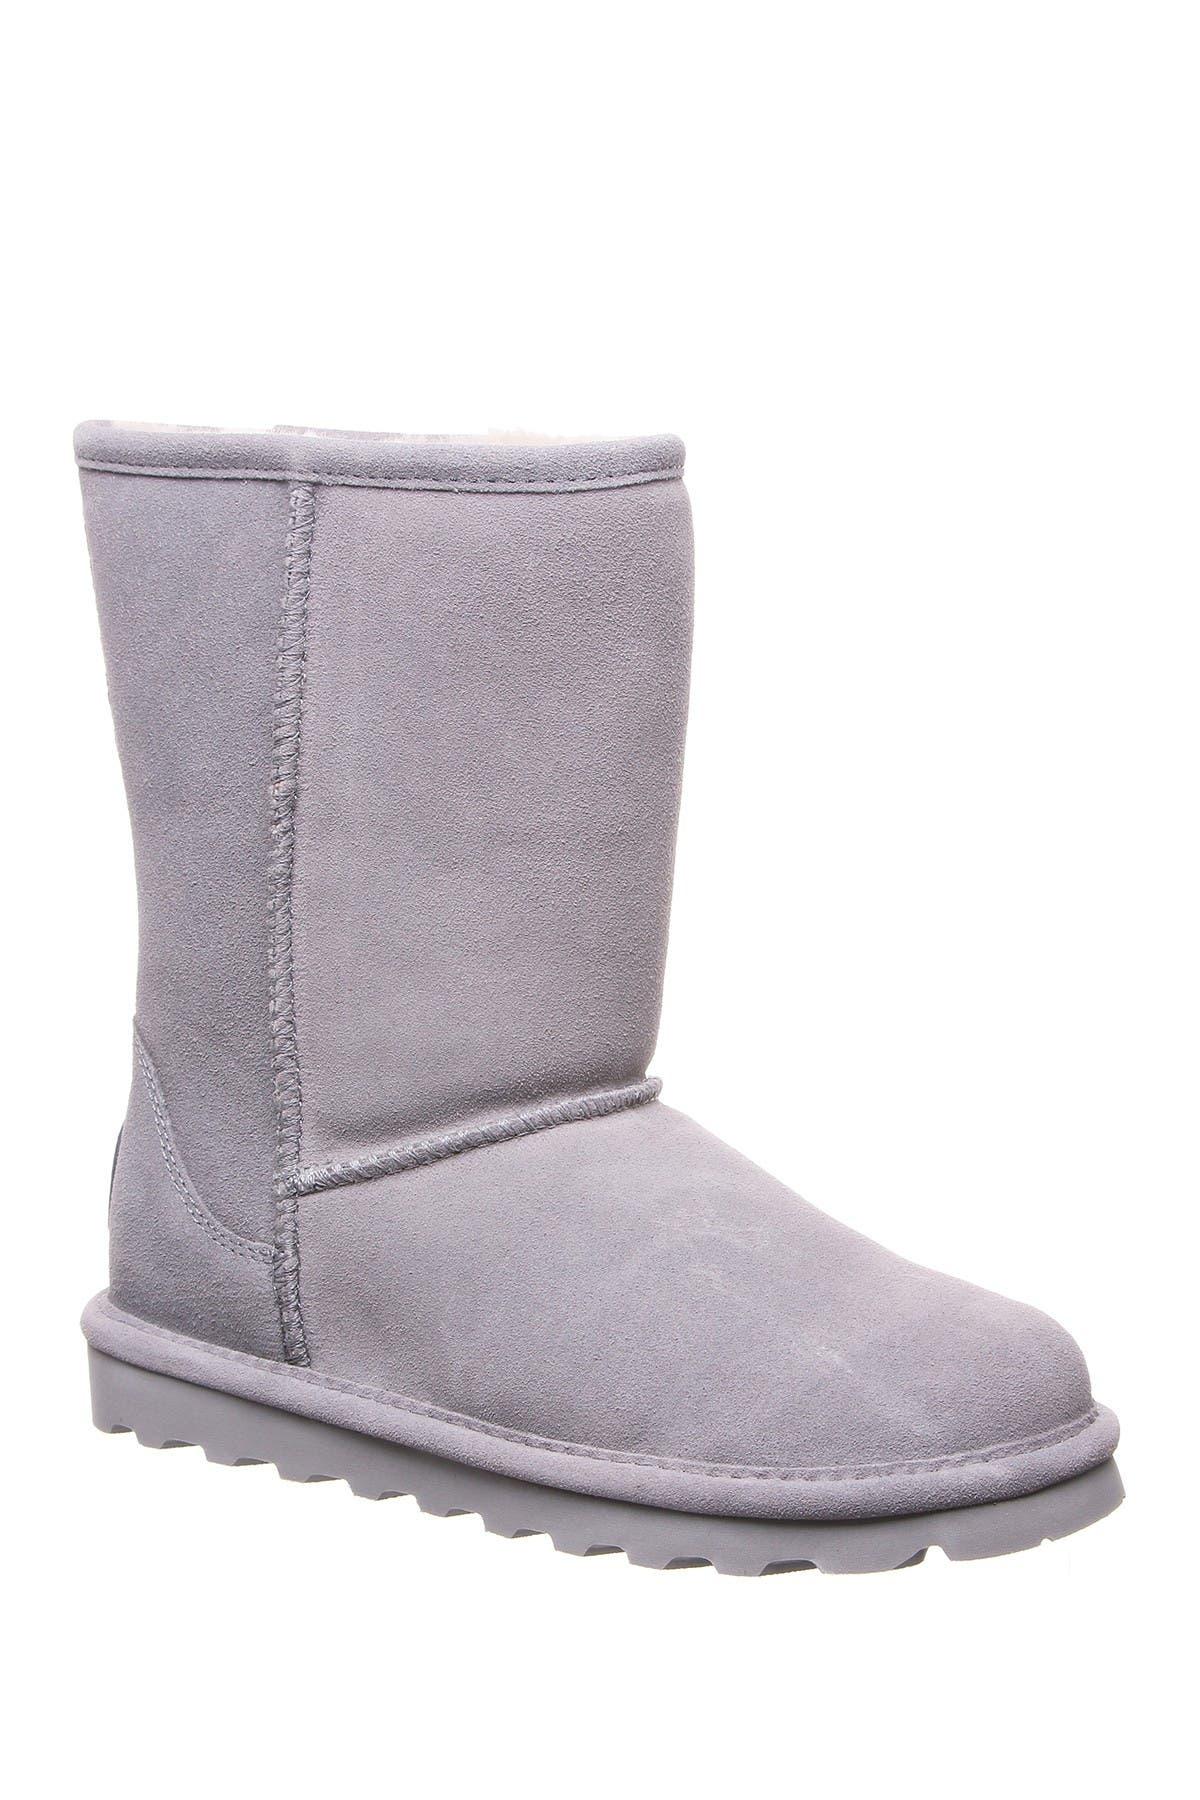 Image of BEARPAW Elle Genuine Sheepskin Waterproof Boot